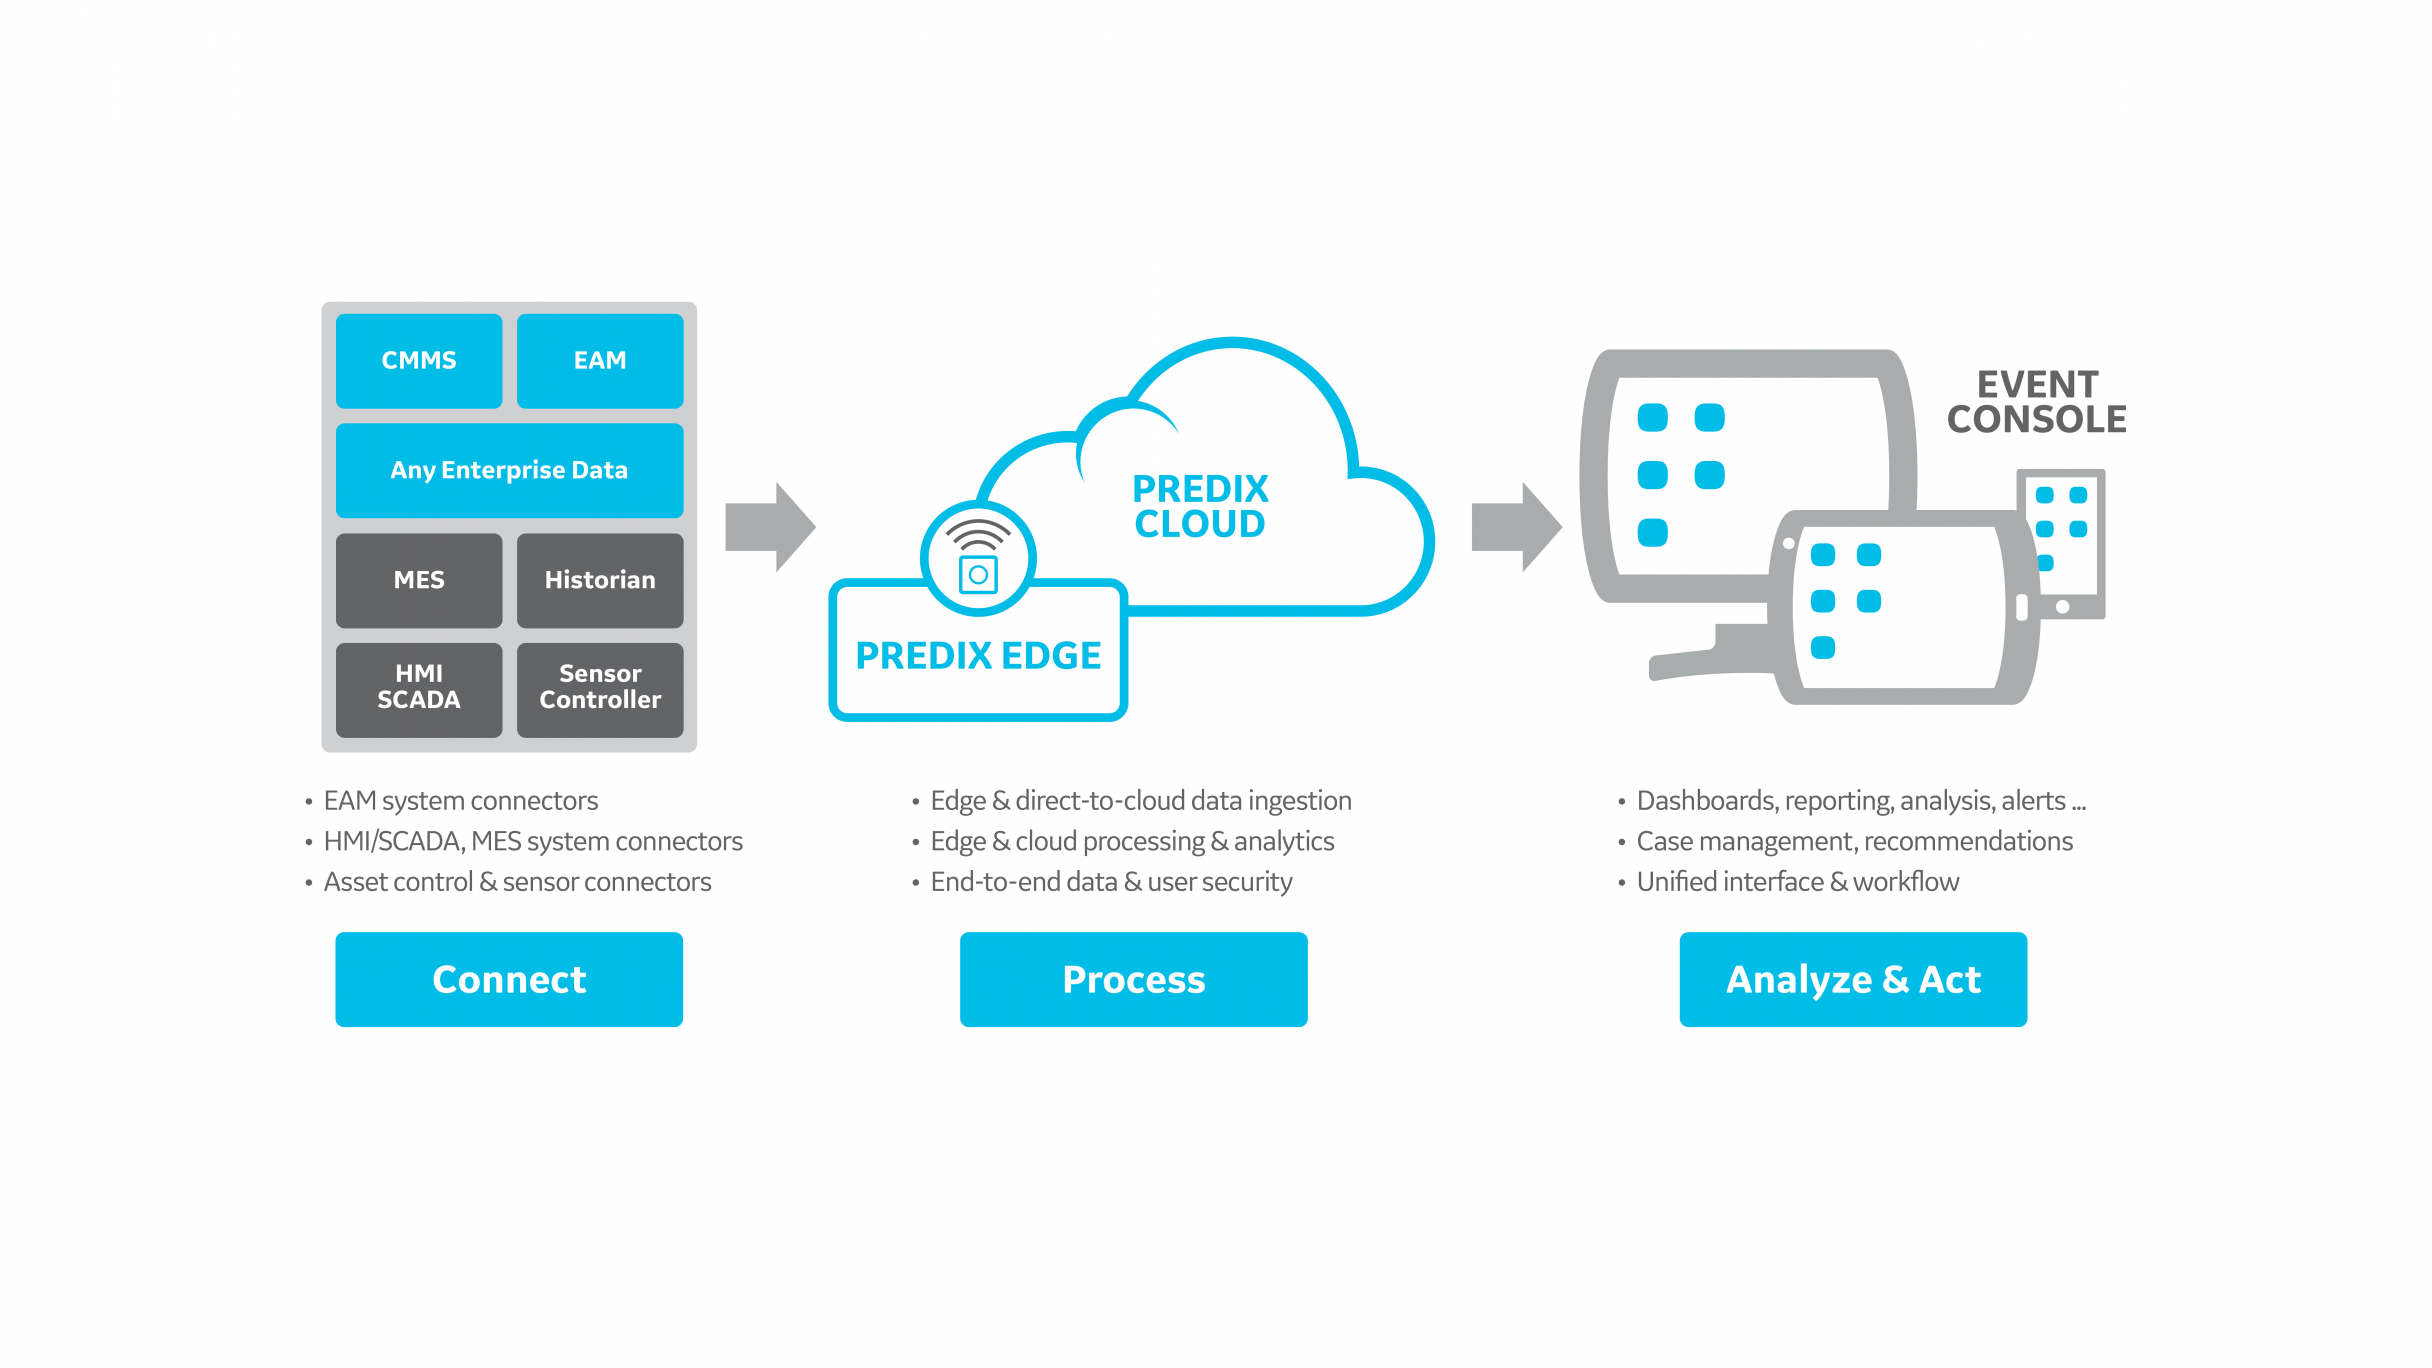 Infographic | Predix Essentials from GE Digital | EAM HMI MES connectors | cloud | dashboard